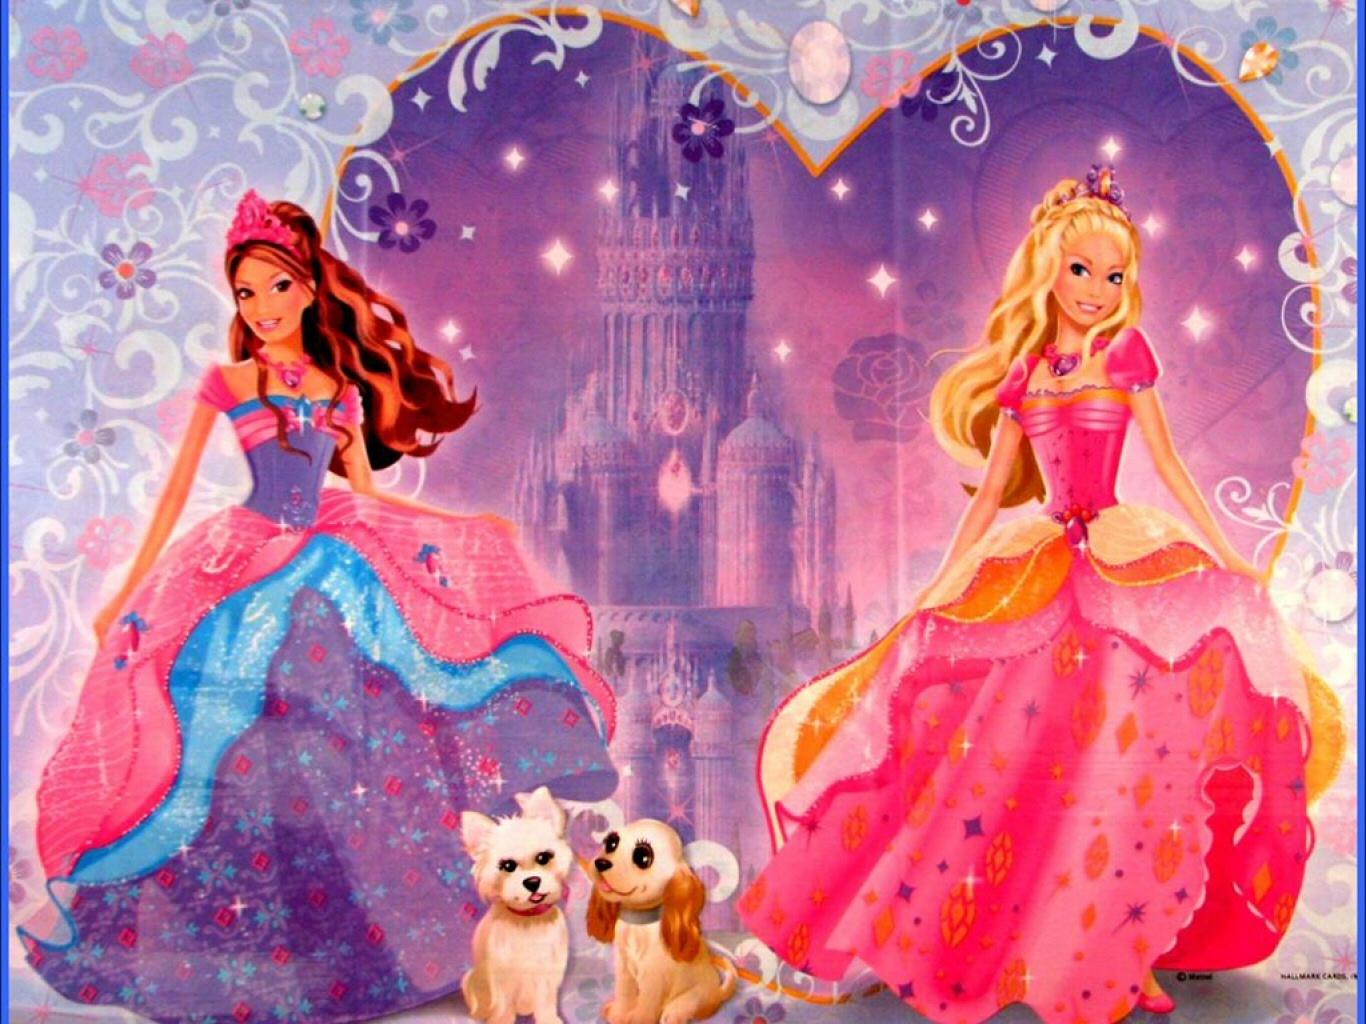 Barbie wallpaper hd - Barbie images for wallpaper ...